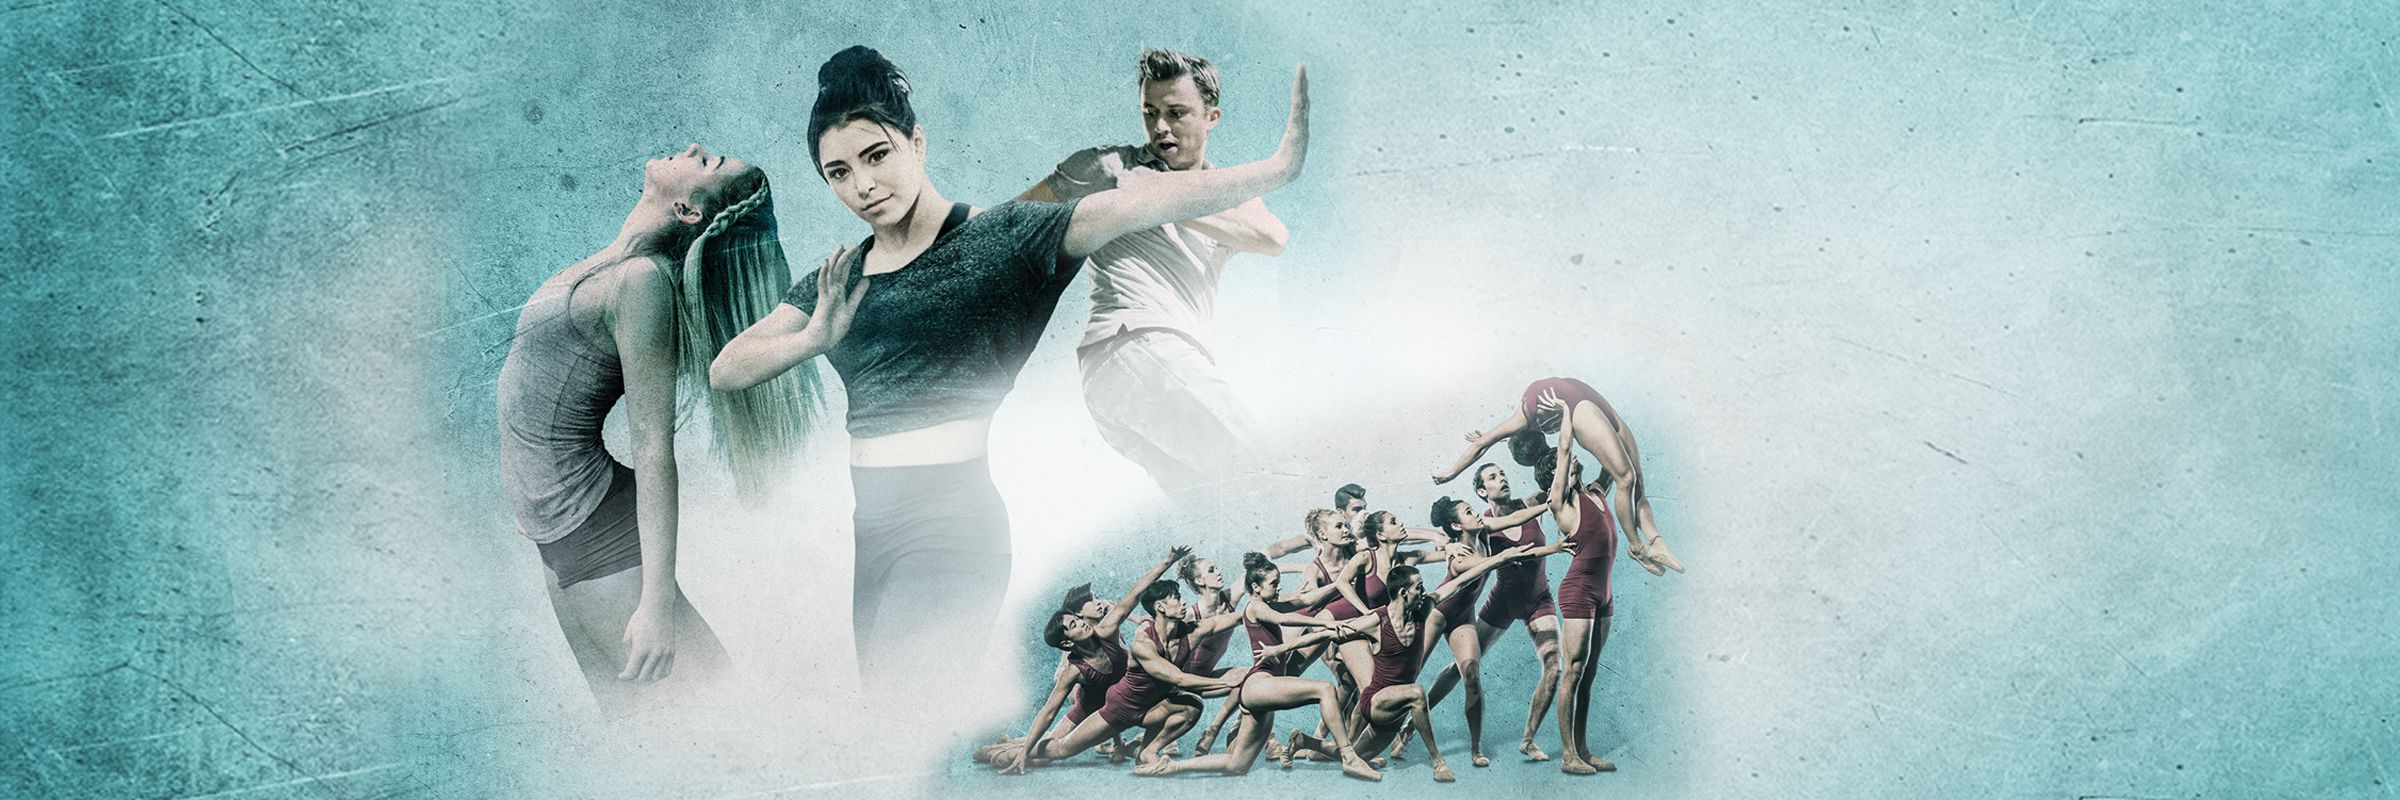 center stage on pointe full movie online free